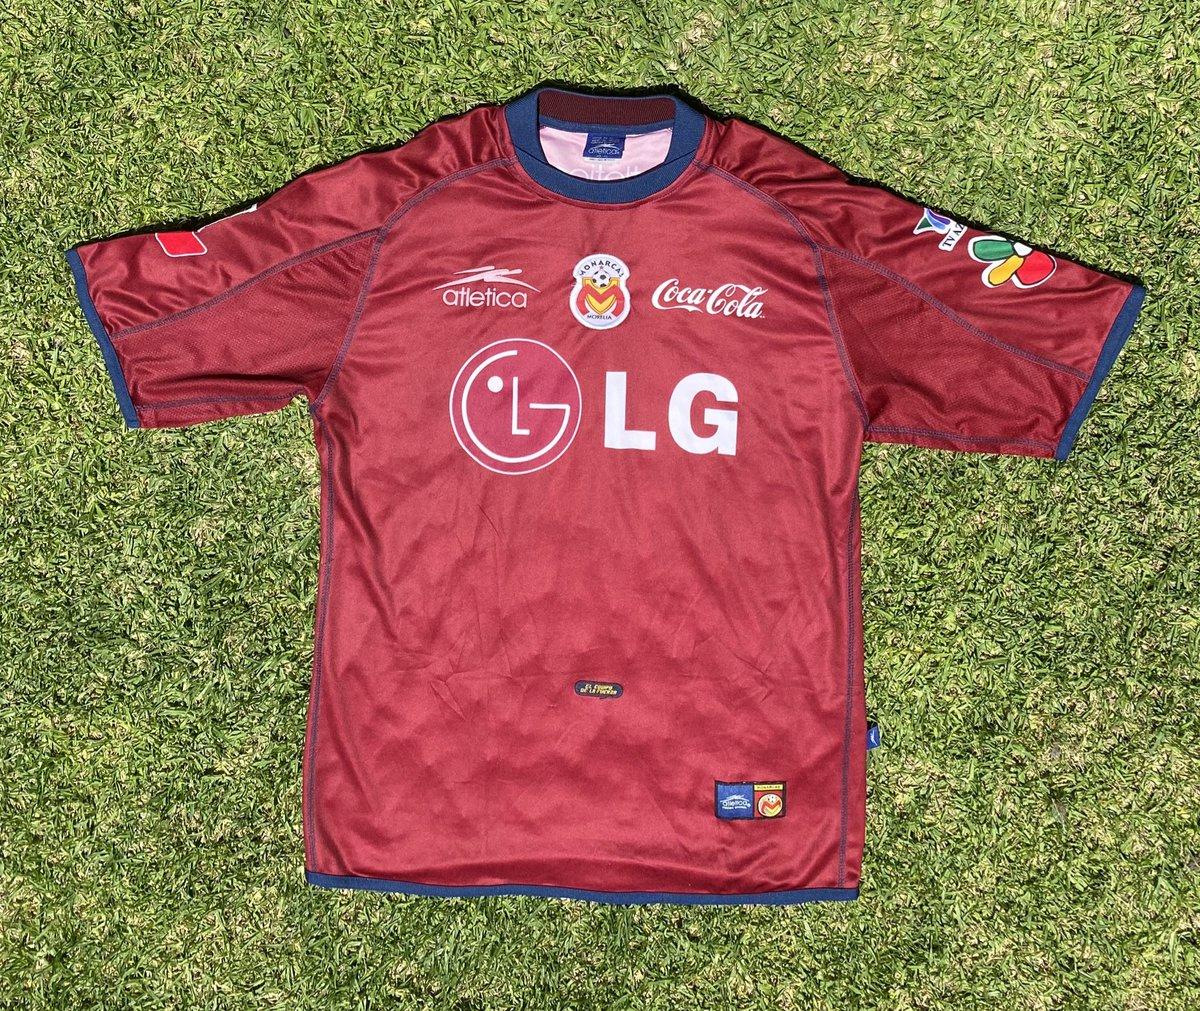 Un #jersey muy elegante 2001-2002.  #MonarcasMorelia #TatoNoriega #Matchworn https://t.co/SxFkM6DxES